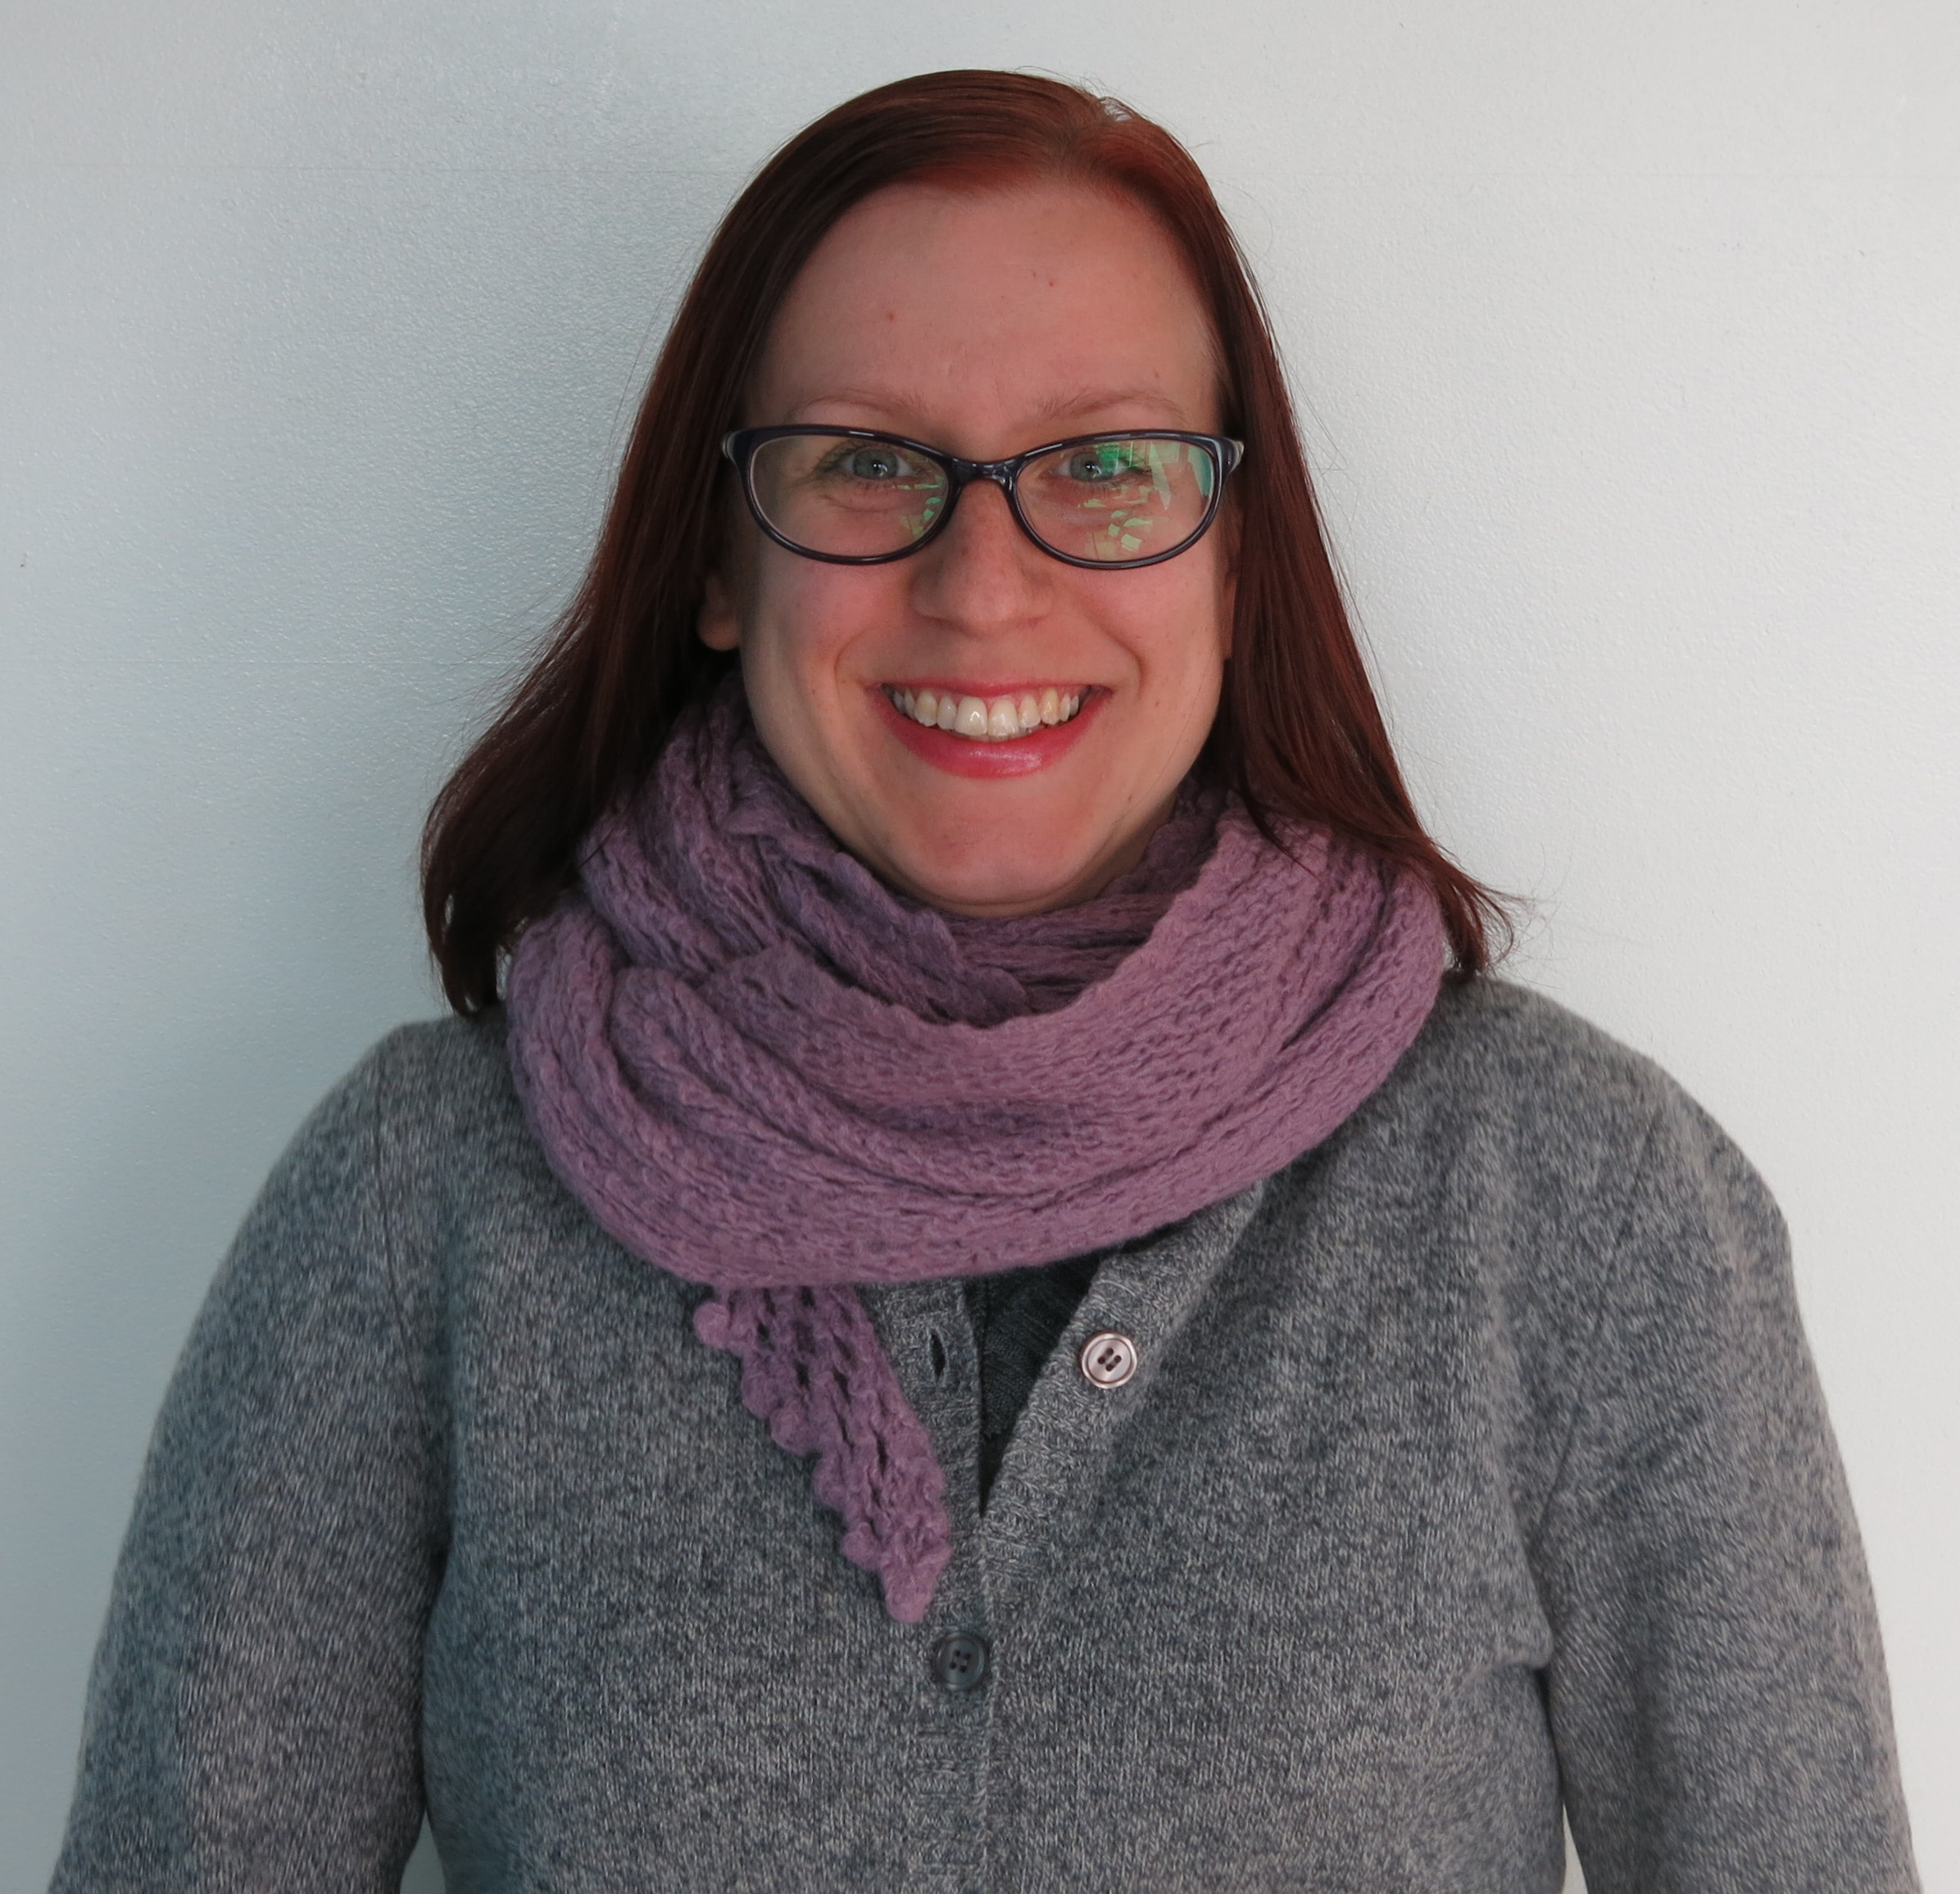 Karolina Jelen